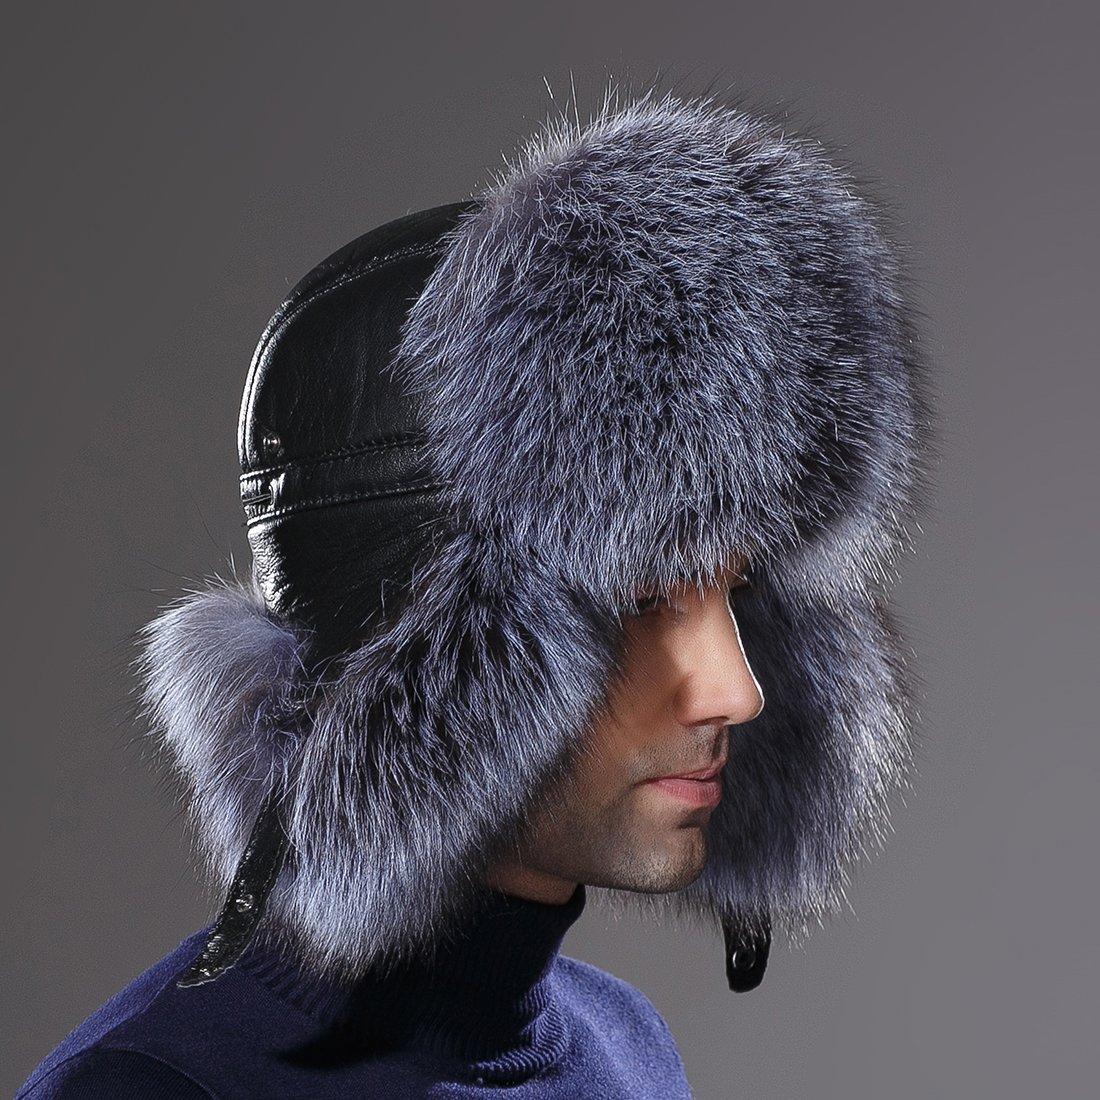 URSFUR Winter Mens Trapper Hat Real Leather Silver Fox Fur Russian Ushanka Cap by URSFUR (Image #9)